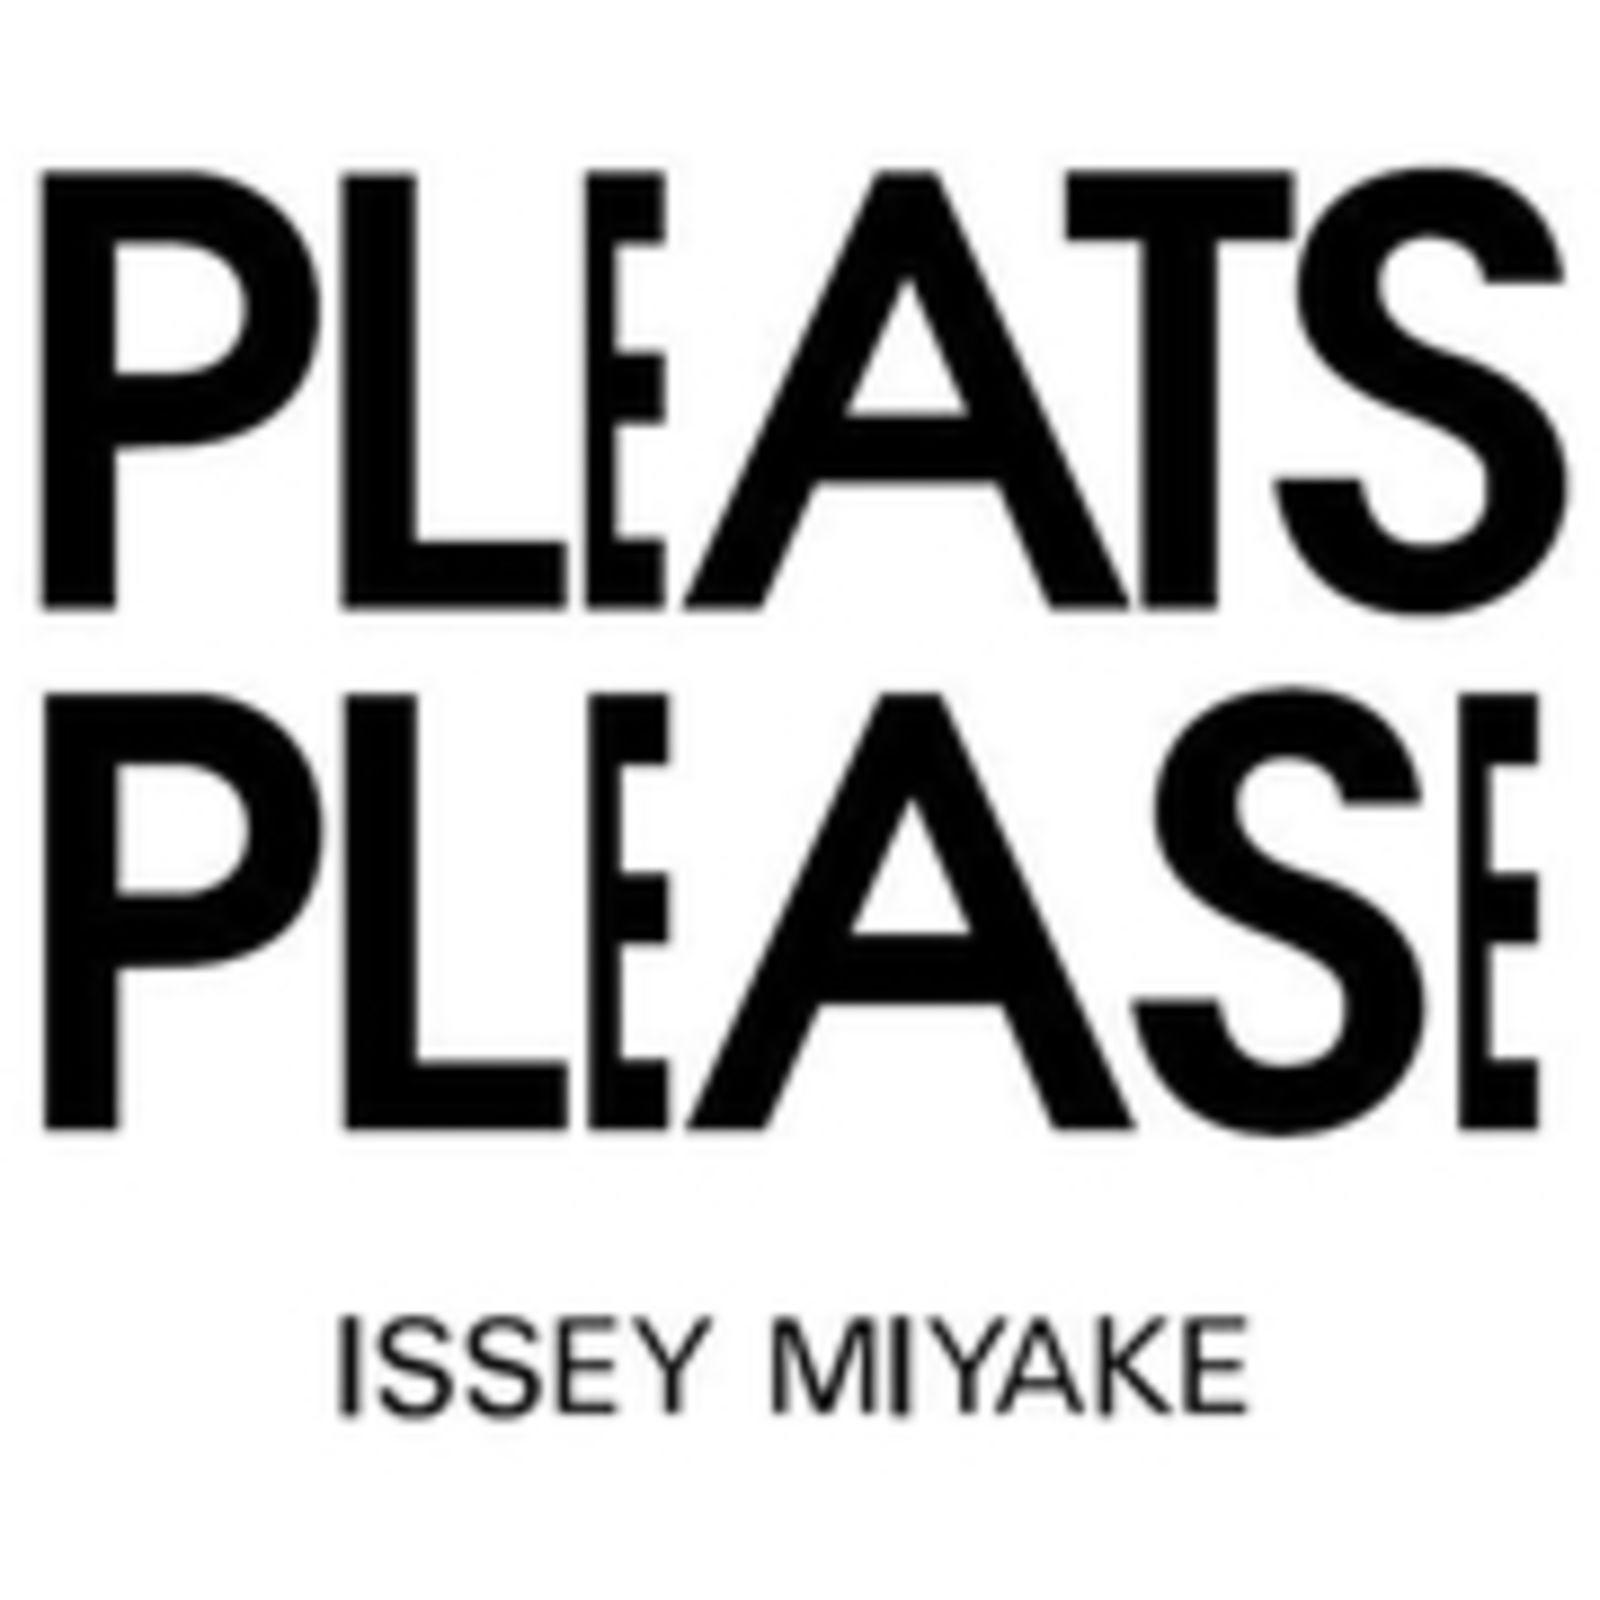 PLEATS PLEASE ISSEY MIYAKE (Image 1)